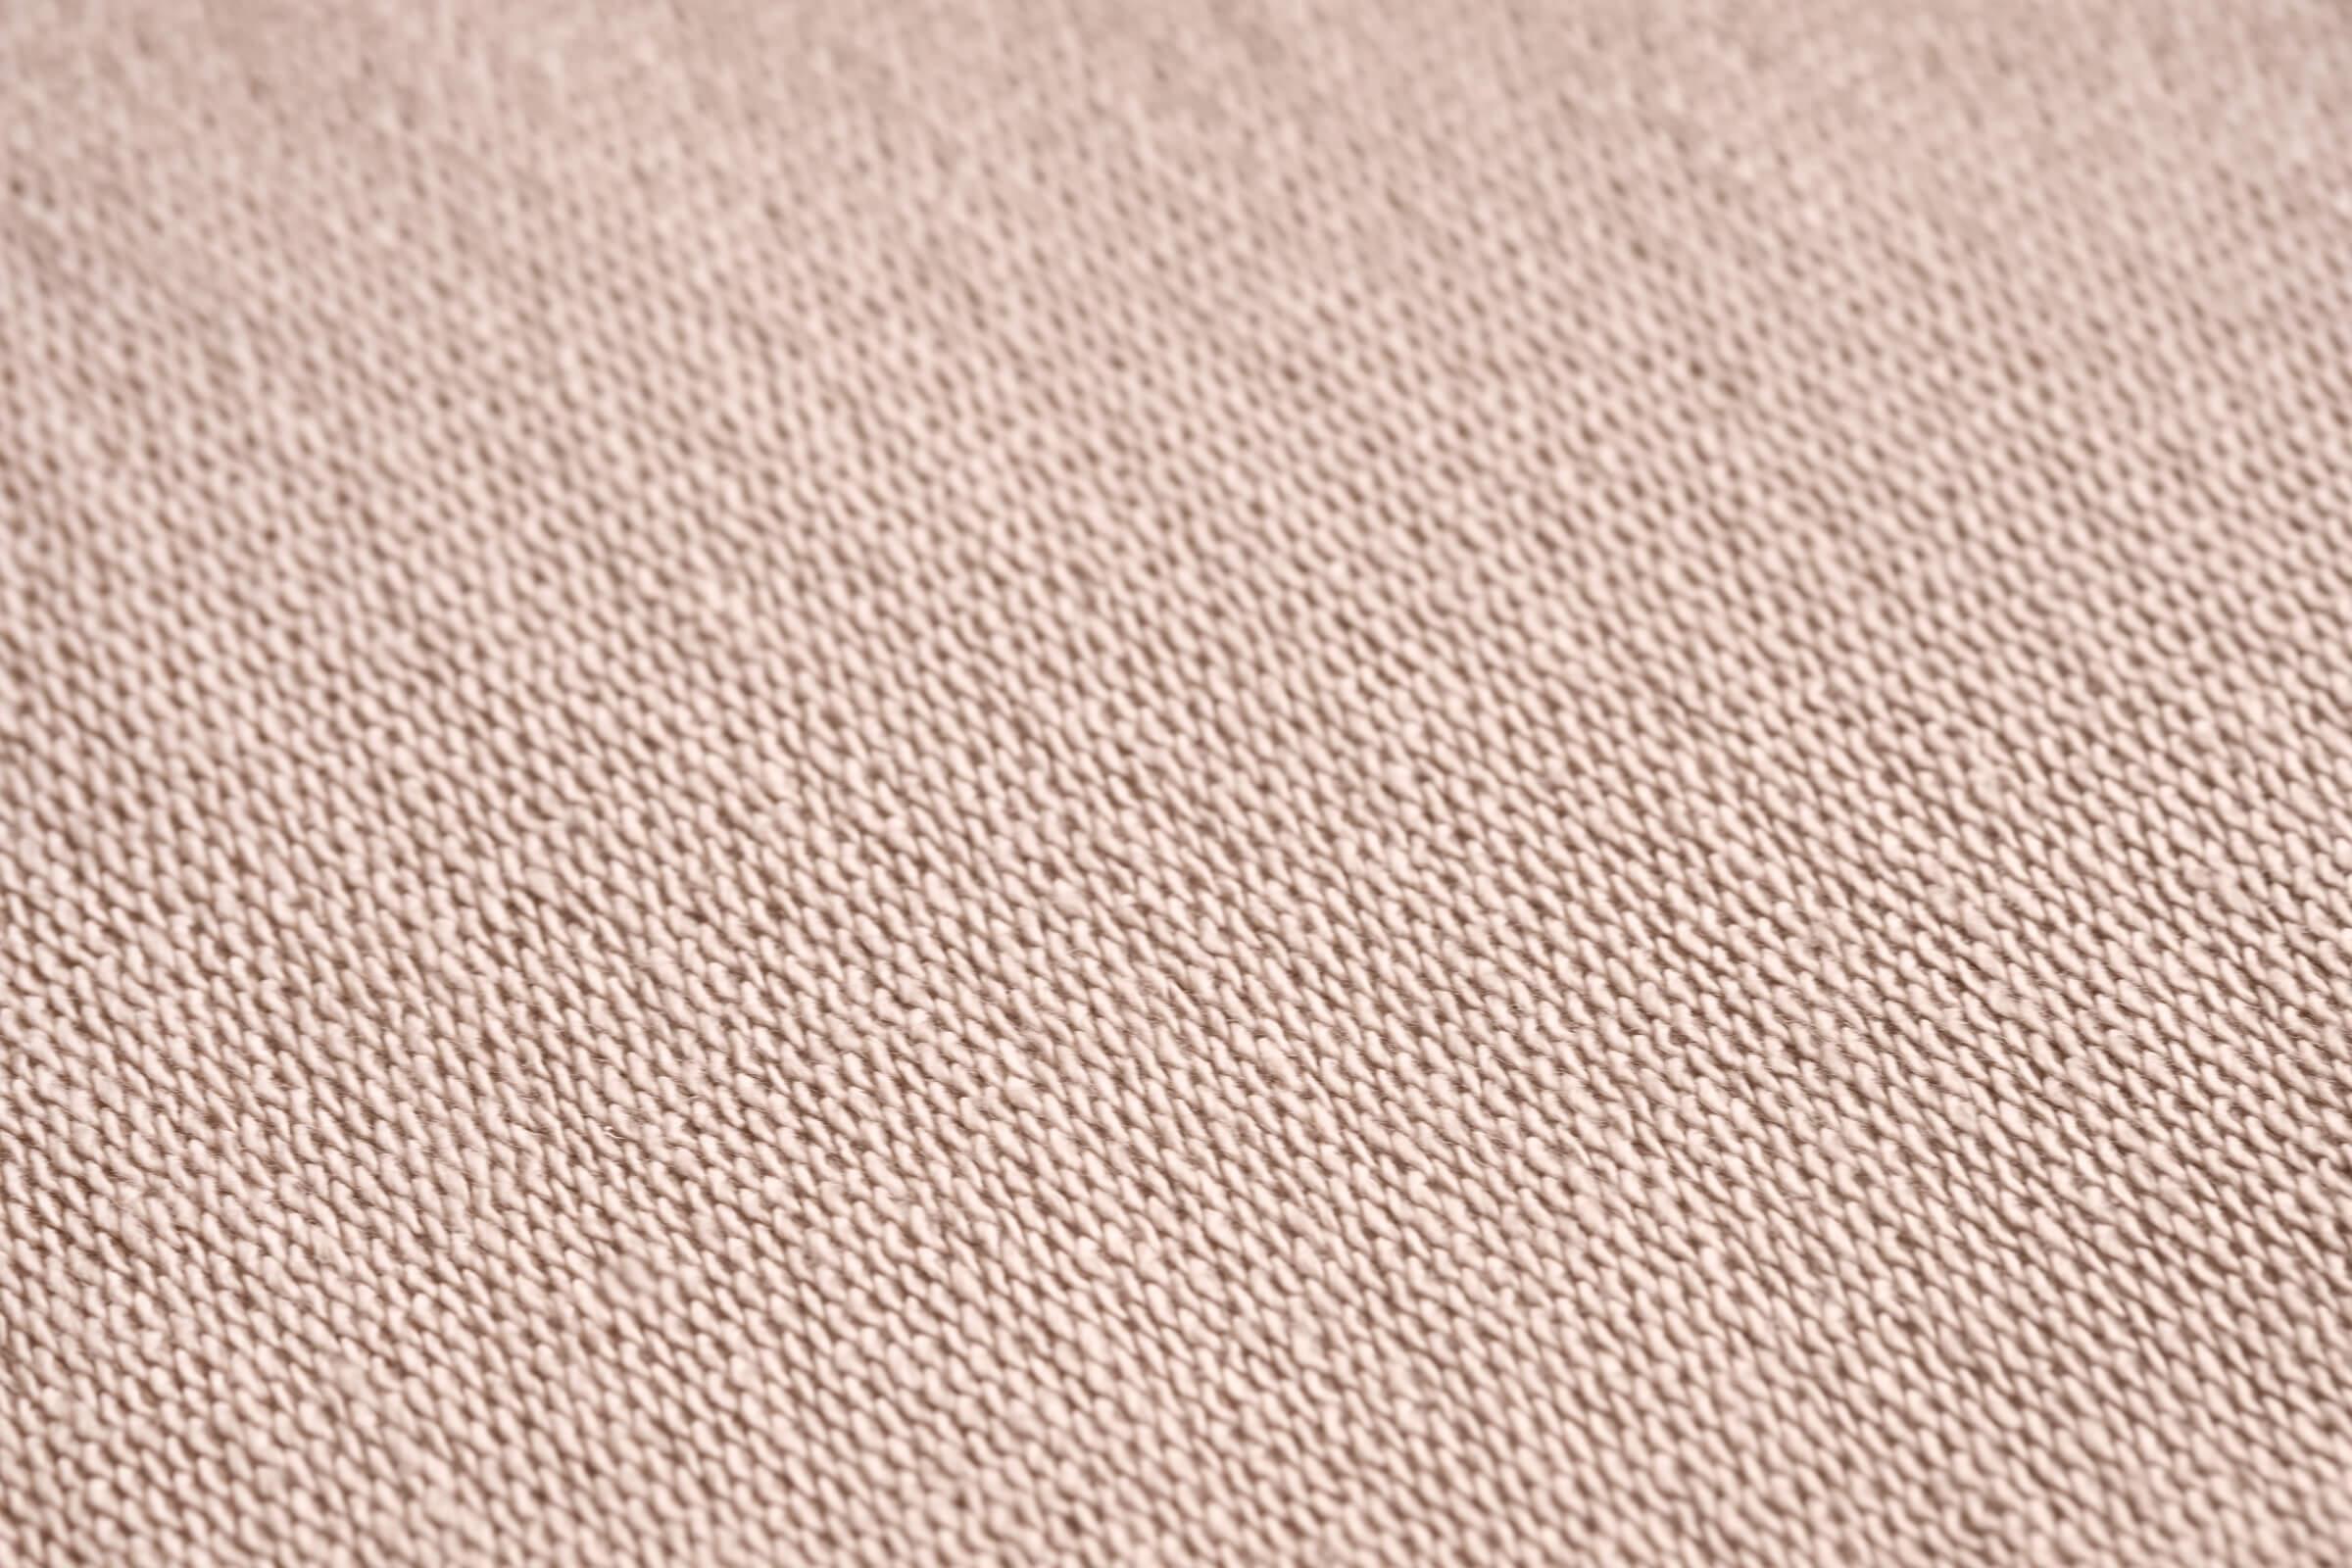 Basiclo knitwear